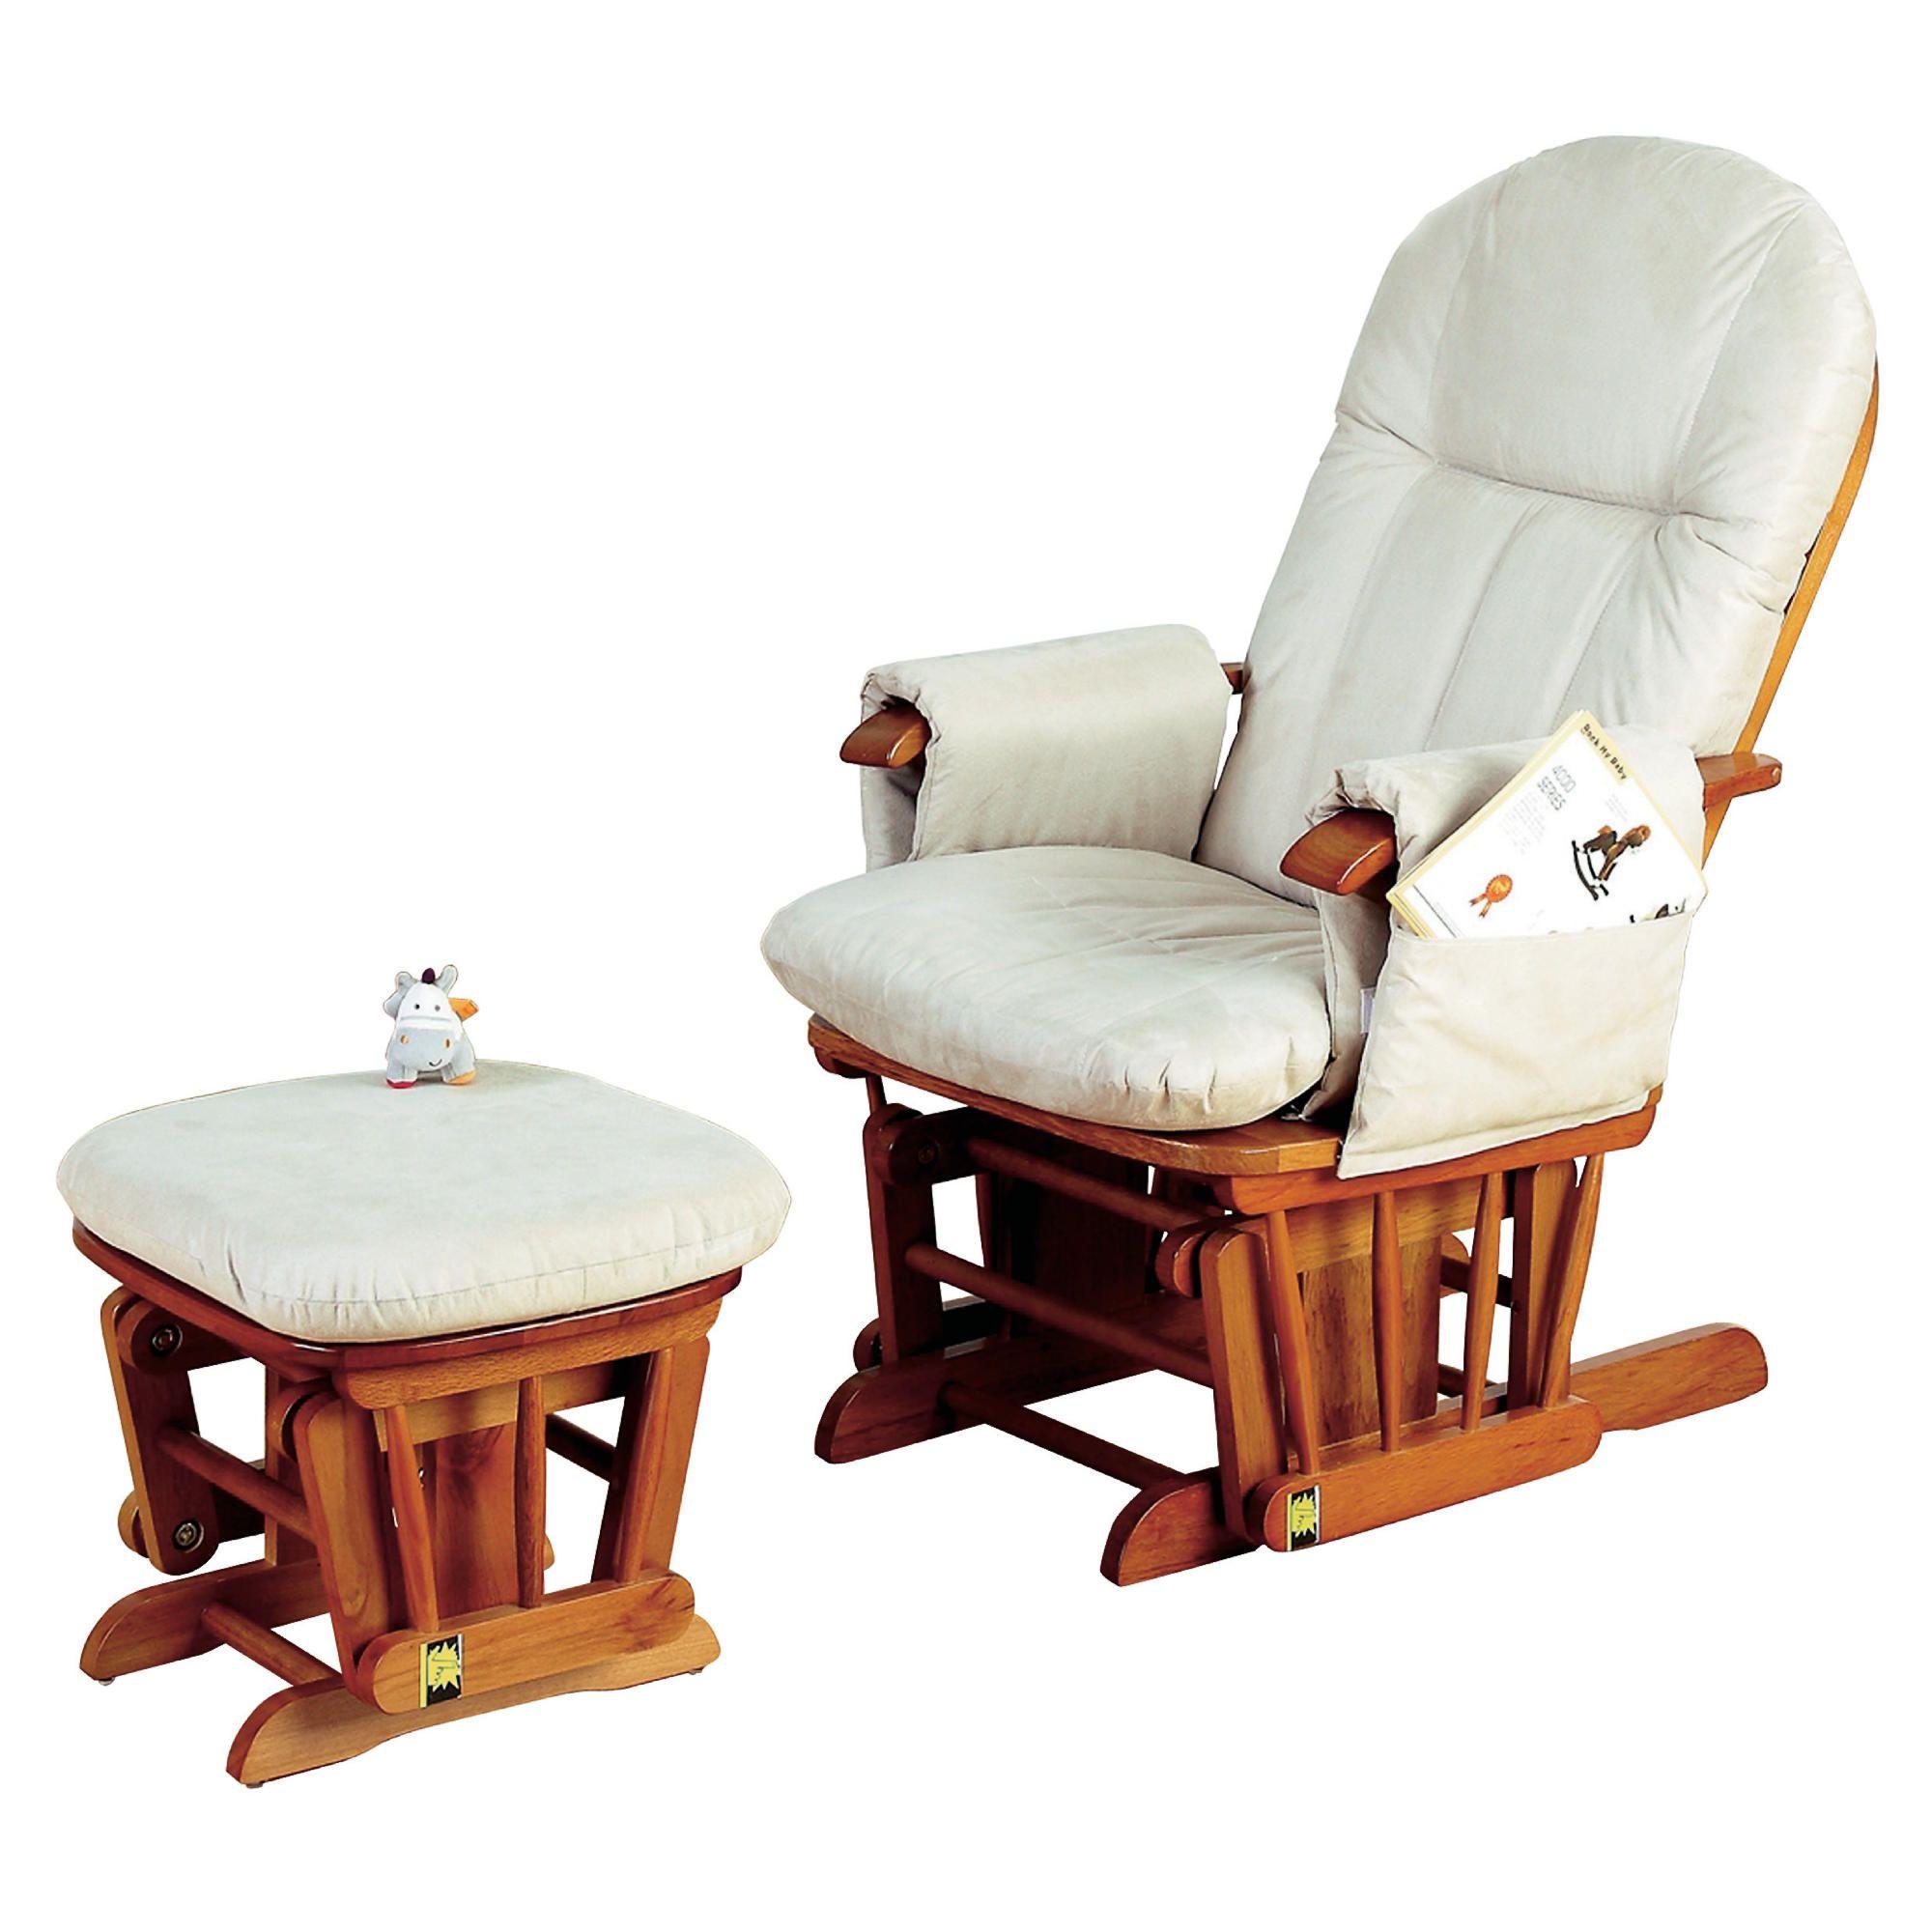 Tutti Bambini Gc35 Reclinable Glider ChairandStool Antique Pine